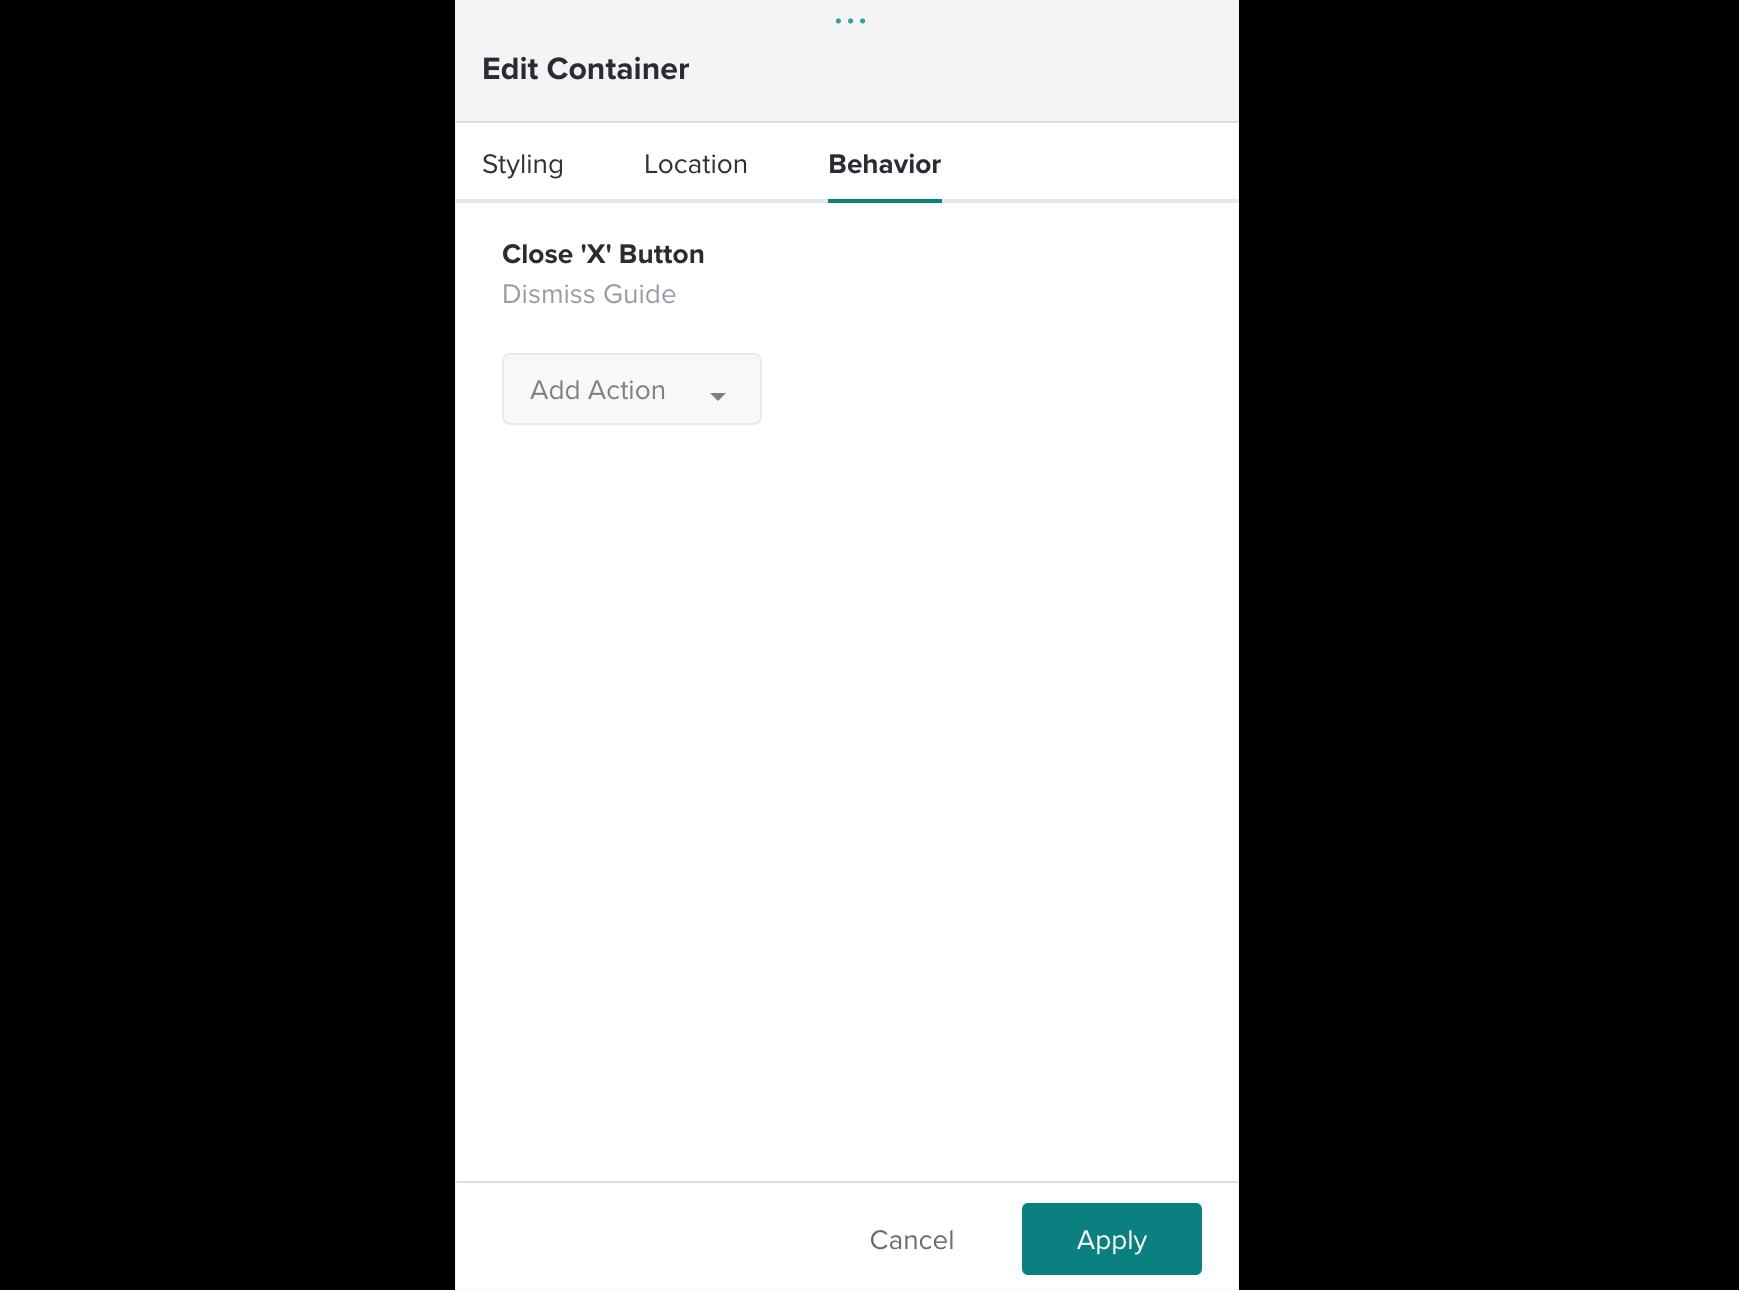 edit-container-behavior.png